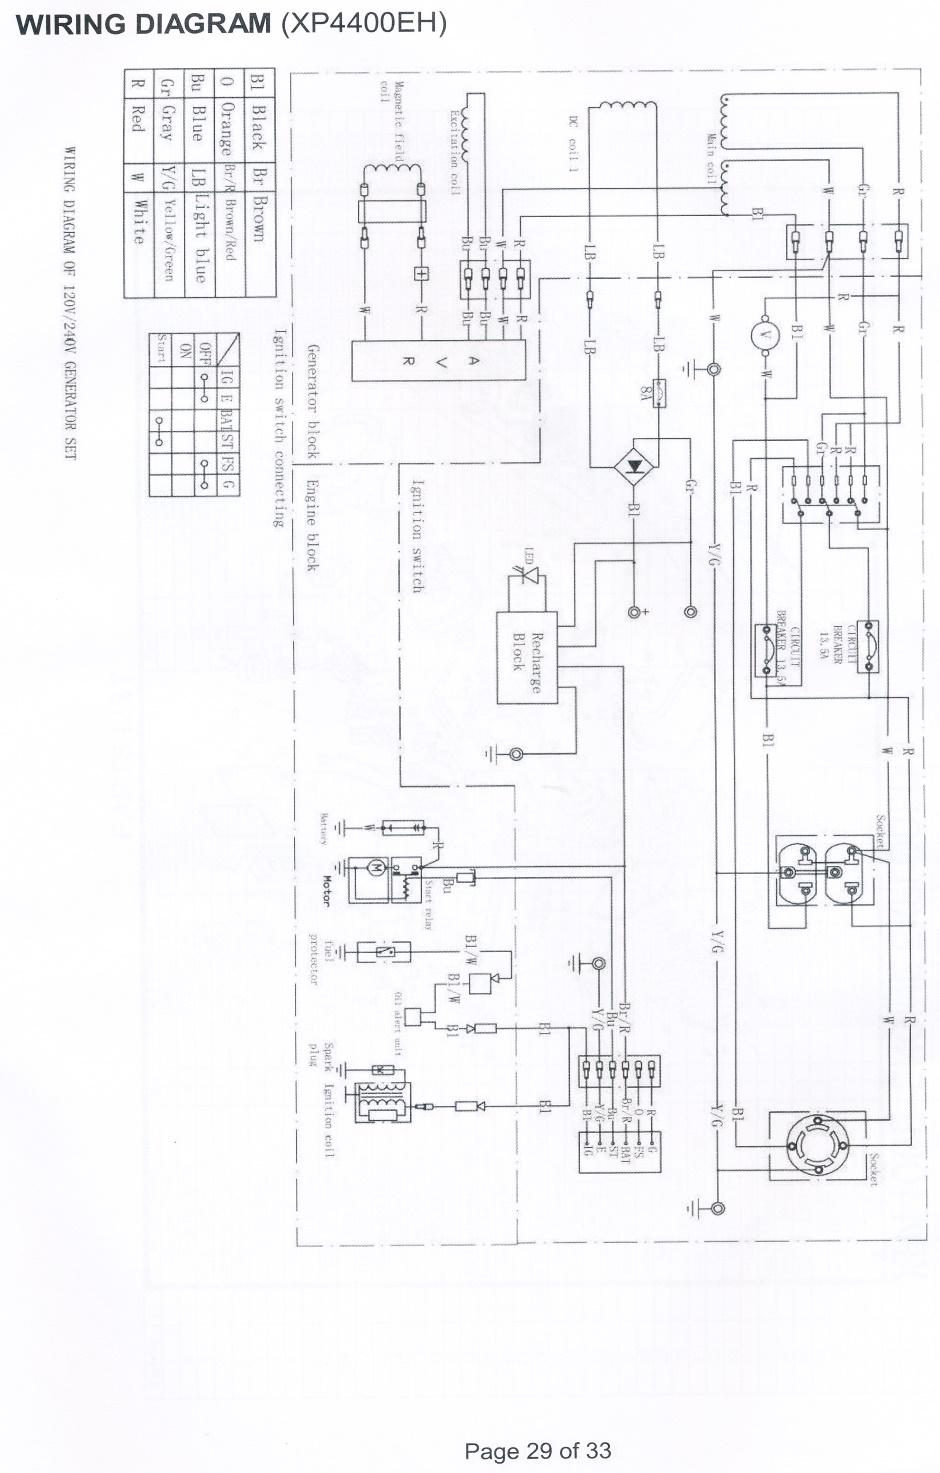 medium resolution of duromax generator wiring diagram wiring diagrams rh 89 treatchildtrauma de generator plug wiring diagram generator schematic diagram